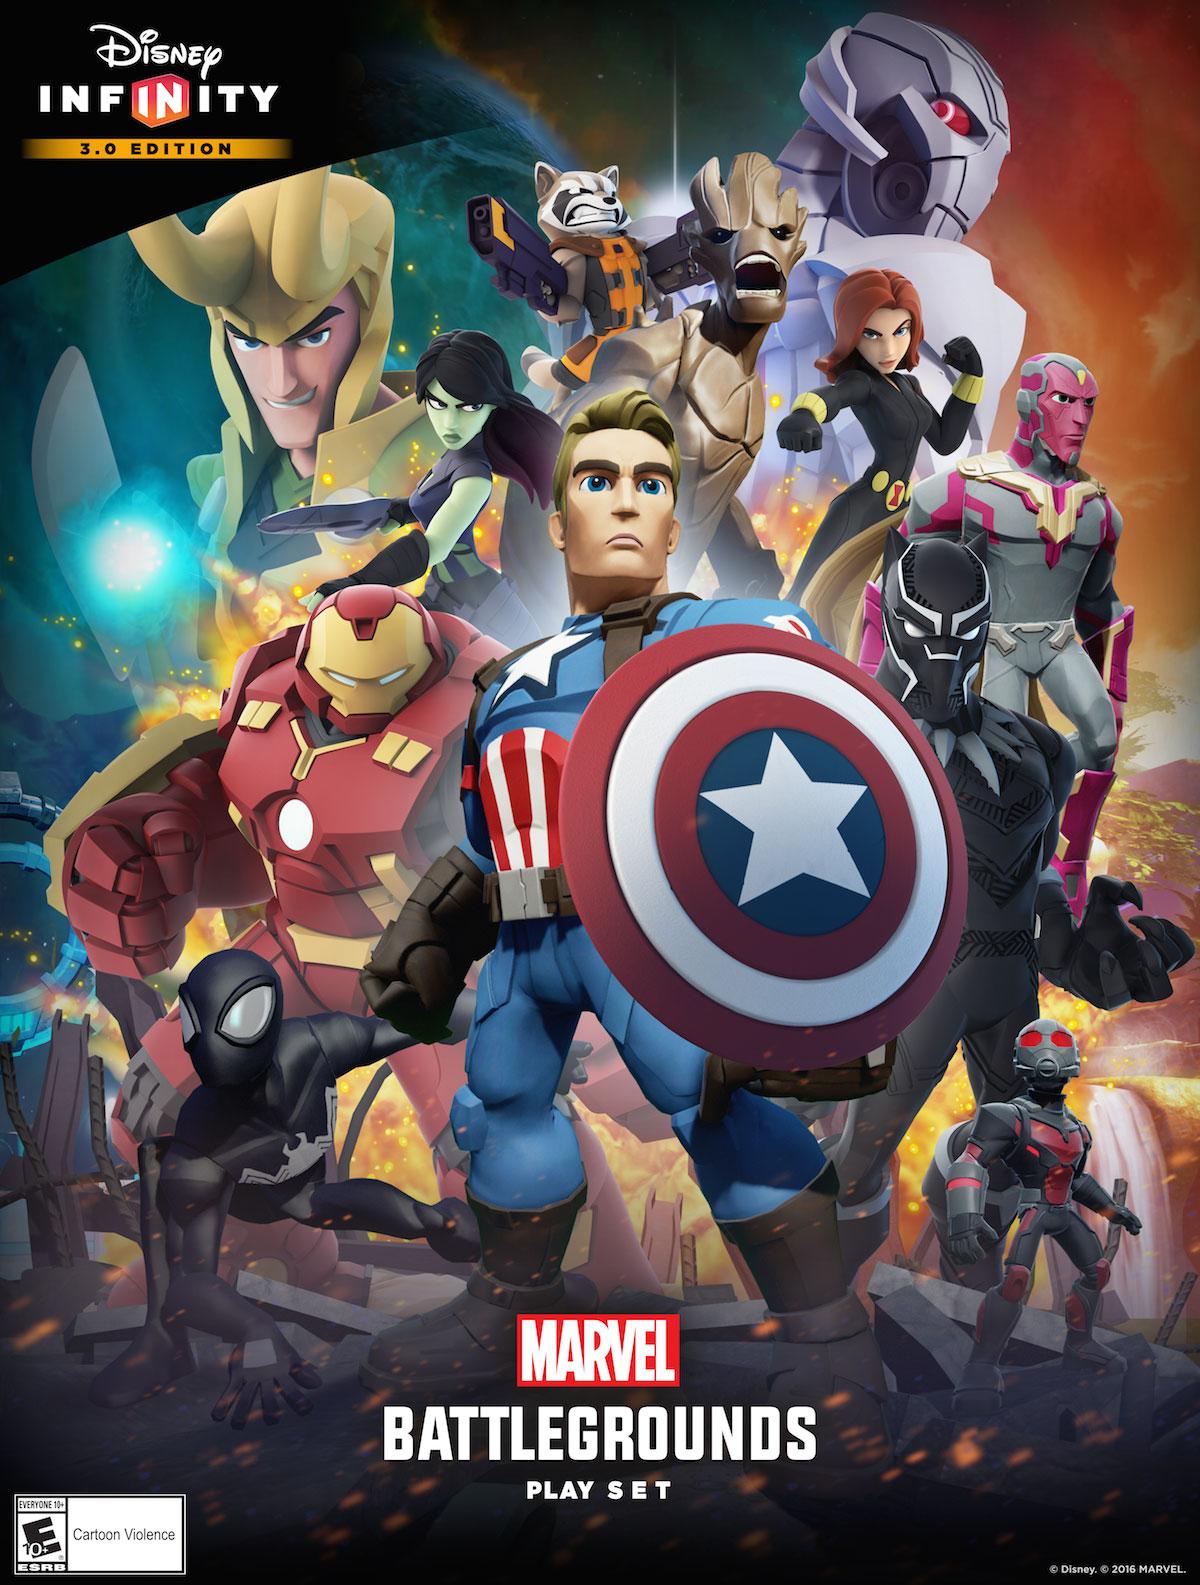 Disney Infinity 3.0 - Marvel Battlegrounds and New Marvel Figures